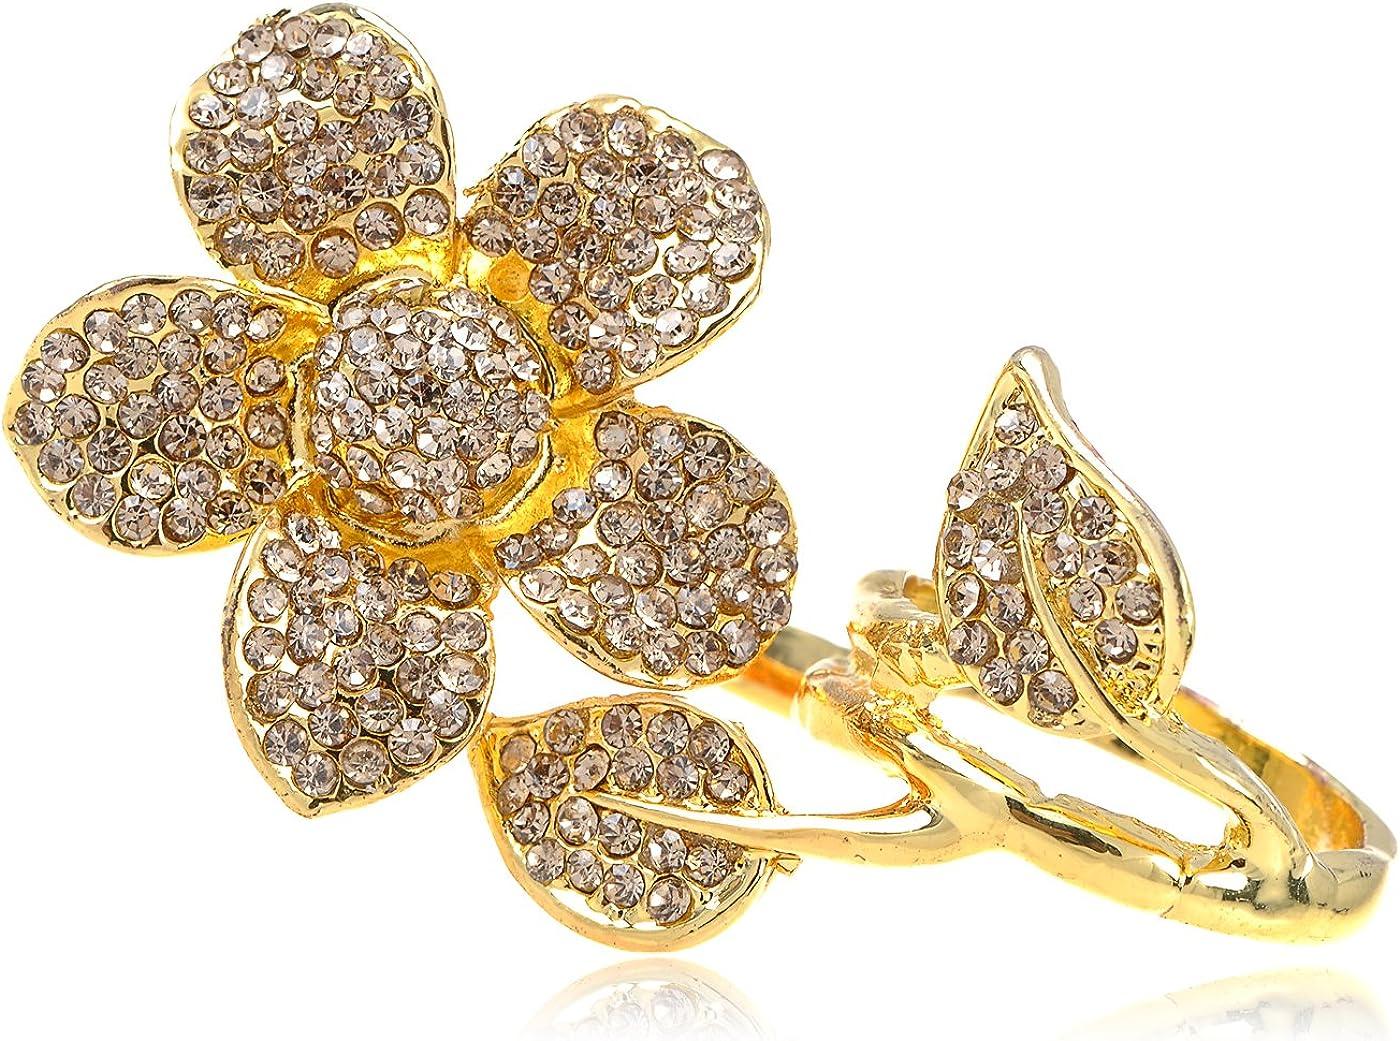 Alilang Two Fingers Daisy Golden Tone Topaz Smokey Light Crystal Rhinestone Flower Ring